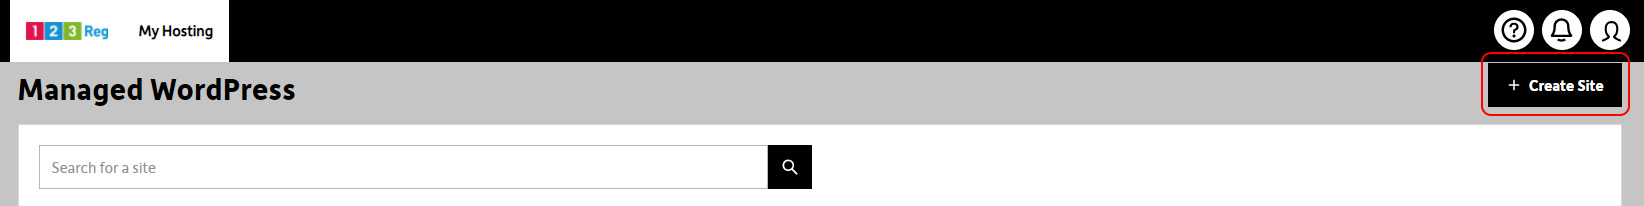 Select Create Site